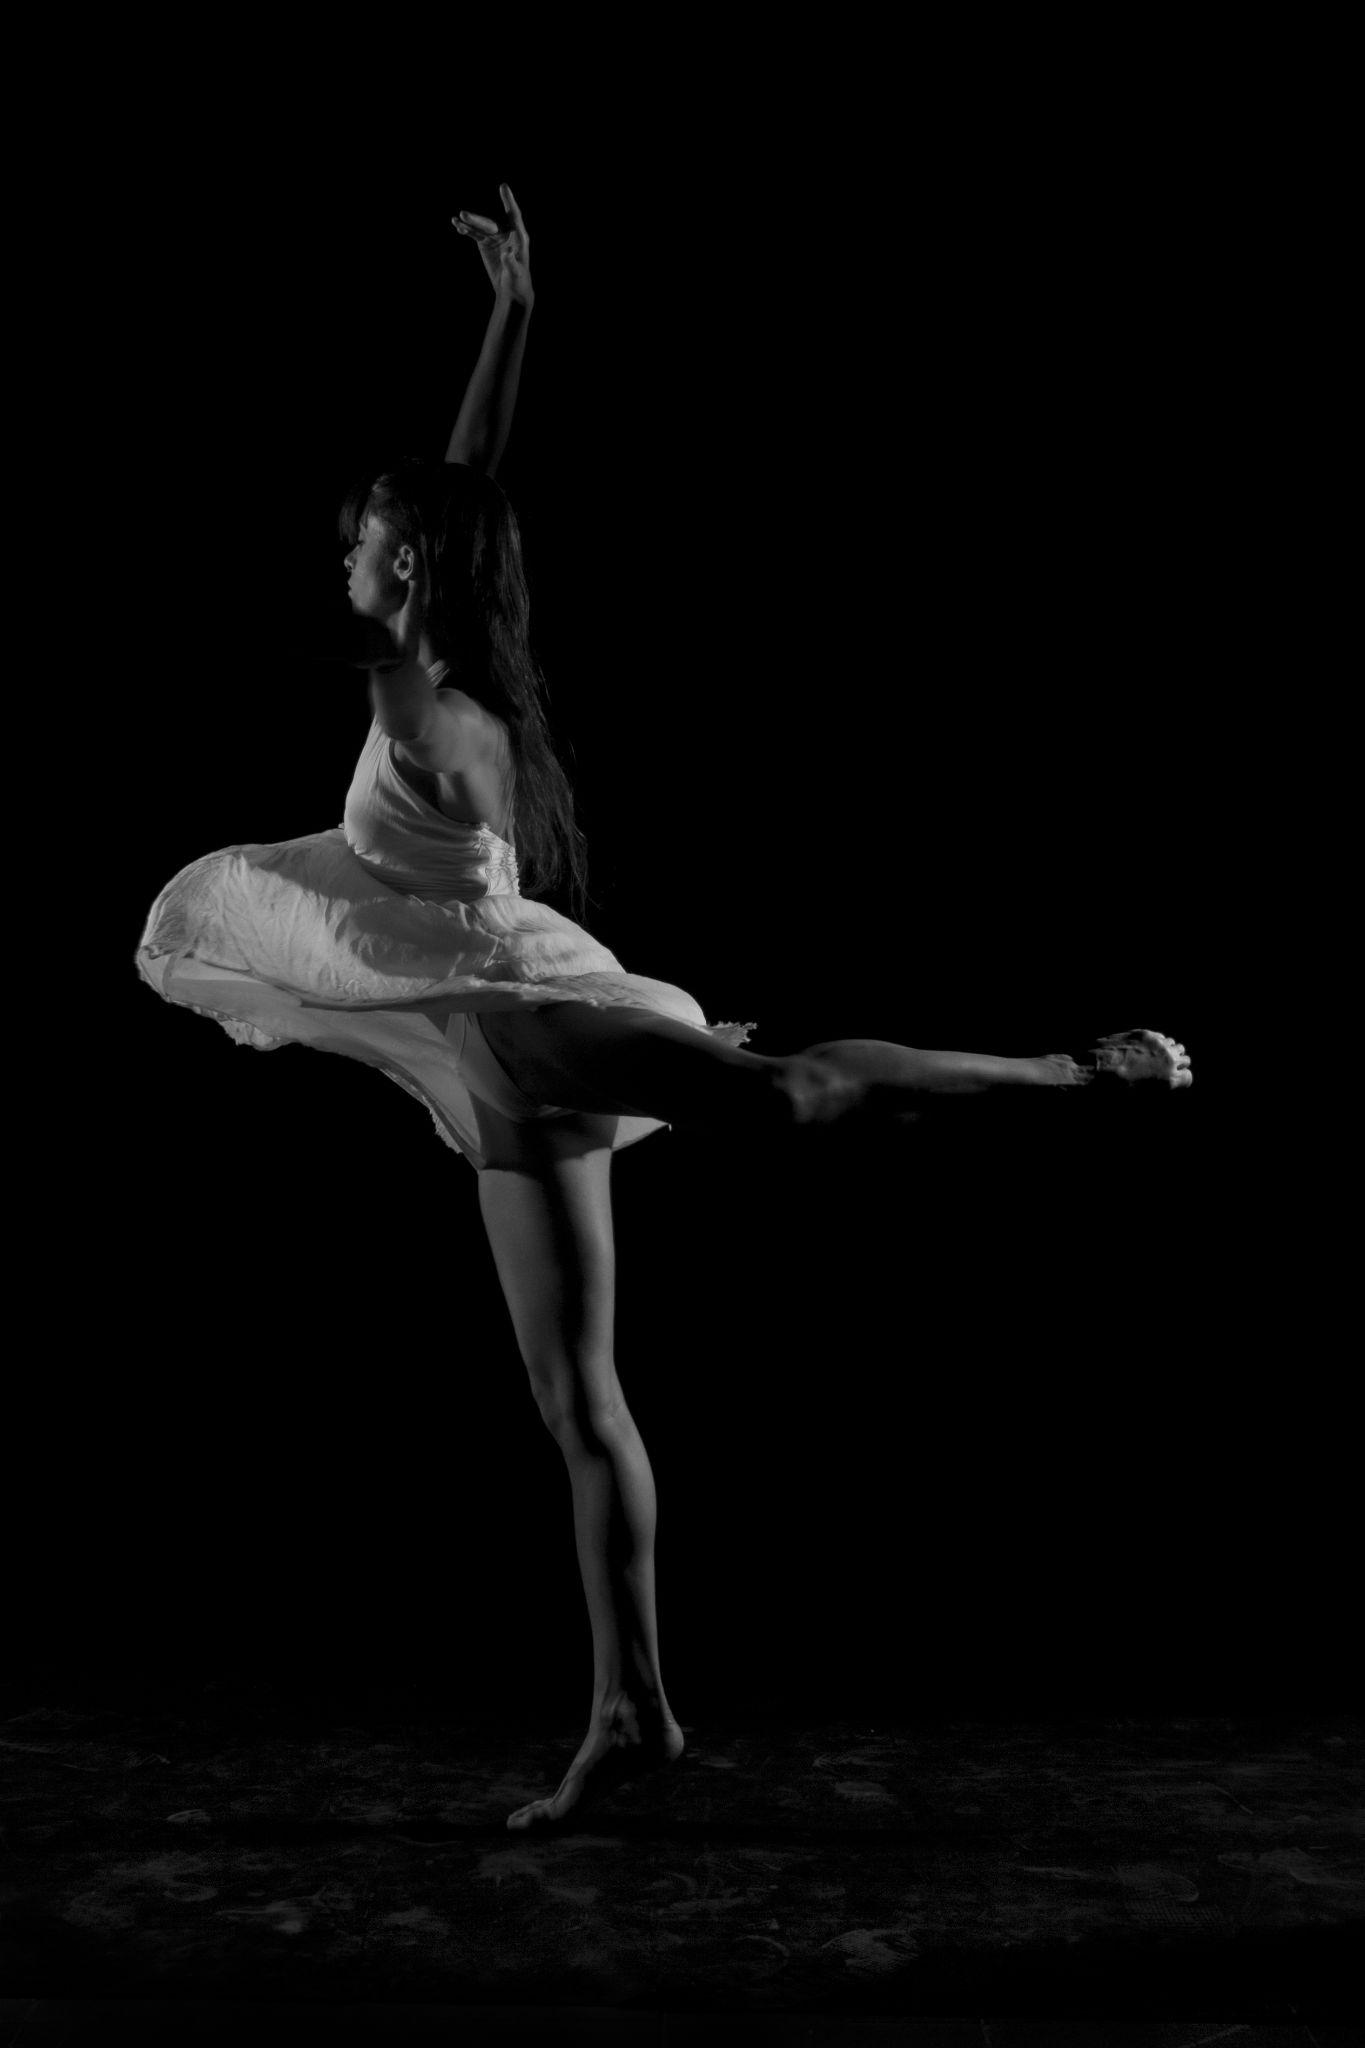 danza////// by mardelrio